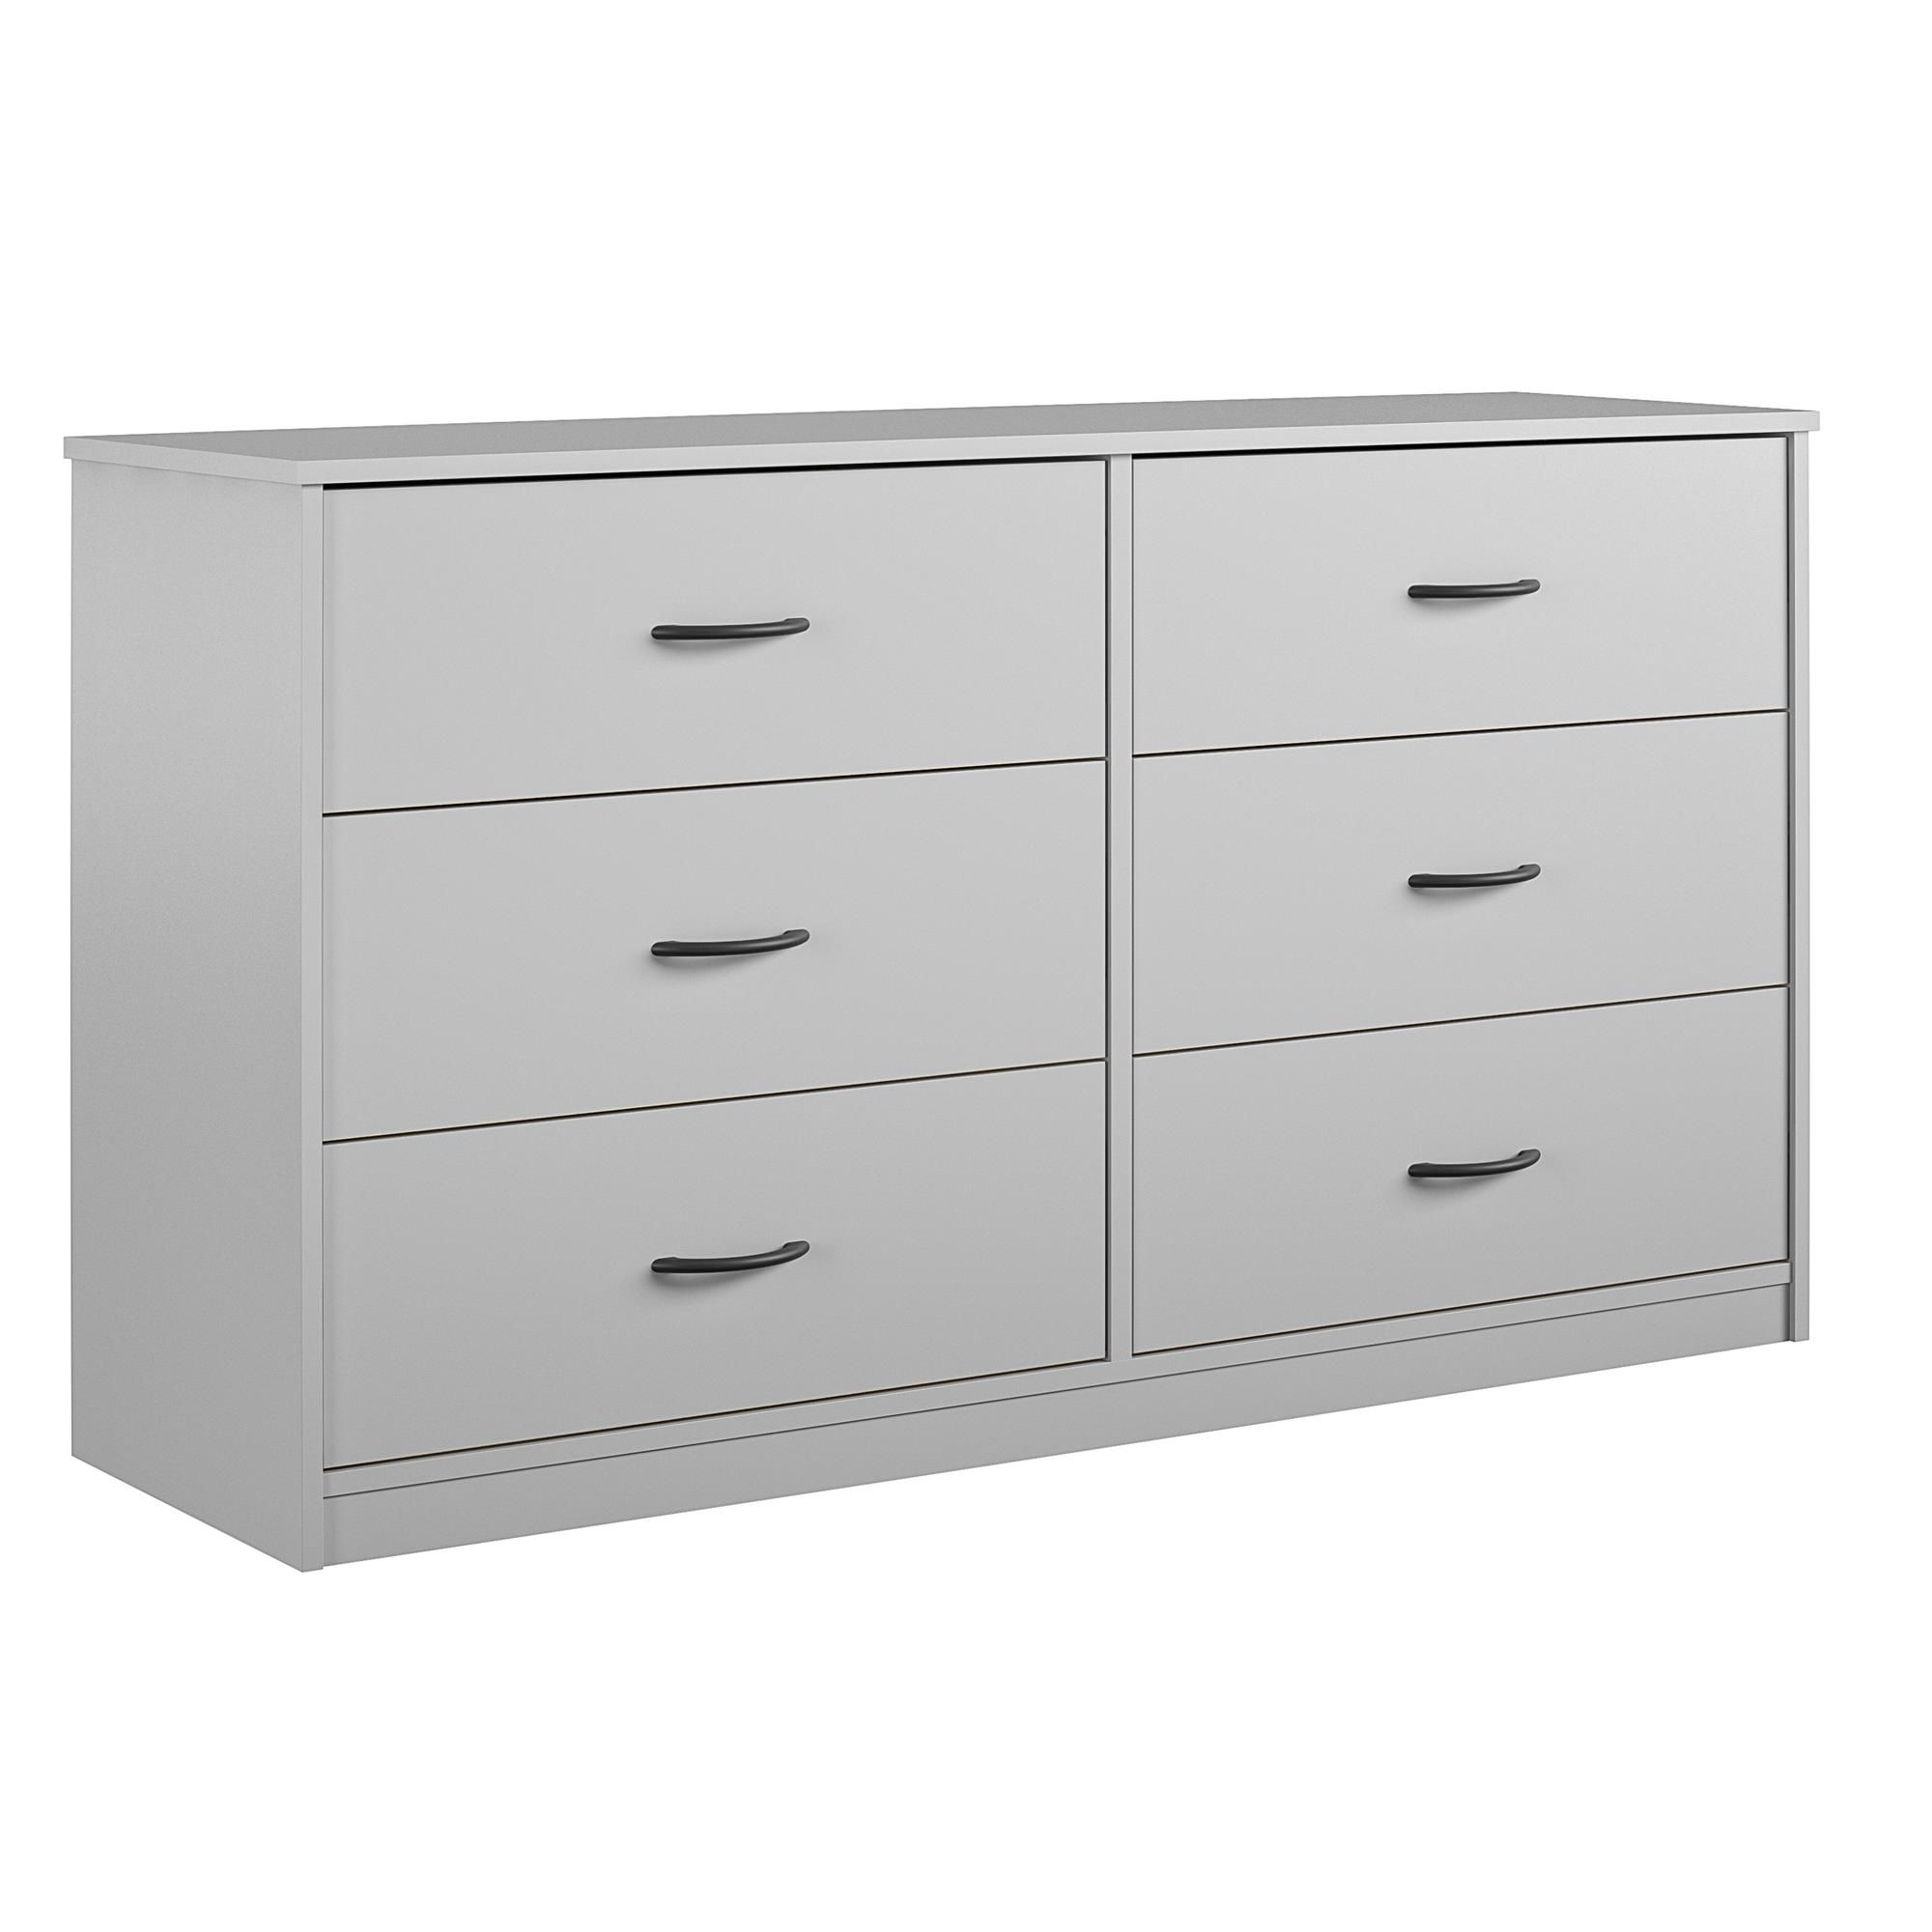 Mainstays Classic 6 Drawer Dresser Dove Gray Walmart Com 6 Drawer Dresser Drawers Walmart Dresser [ 2000 x 2000 Pixel ]